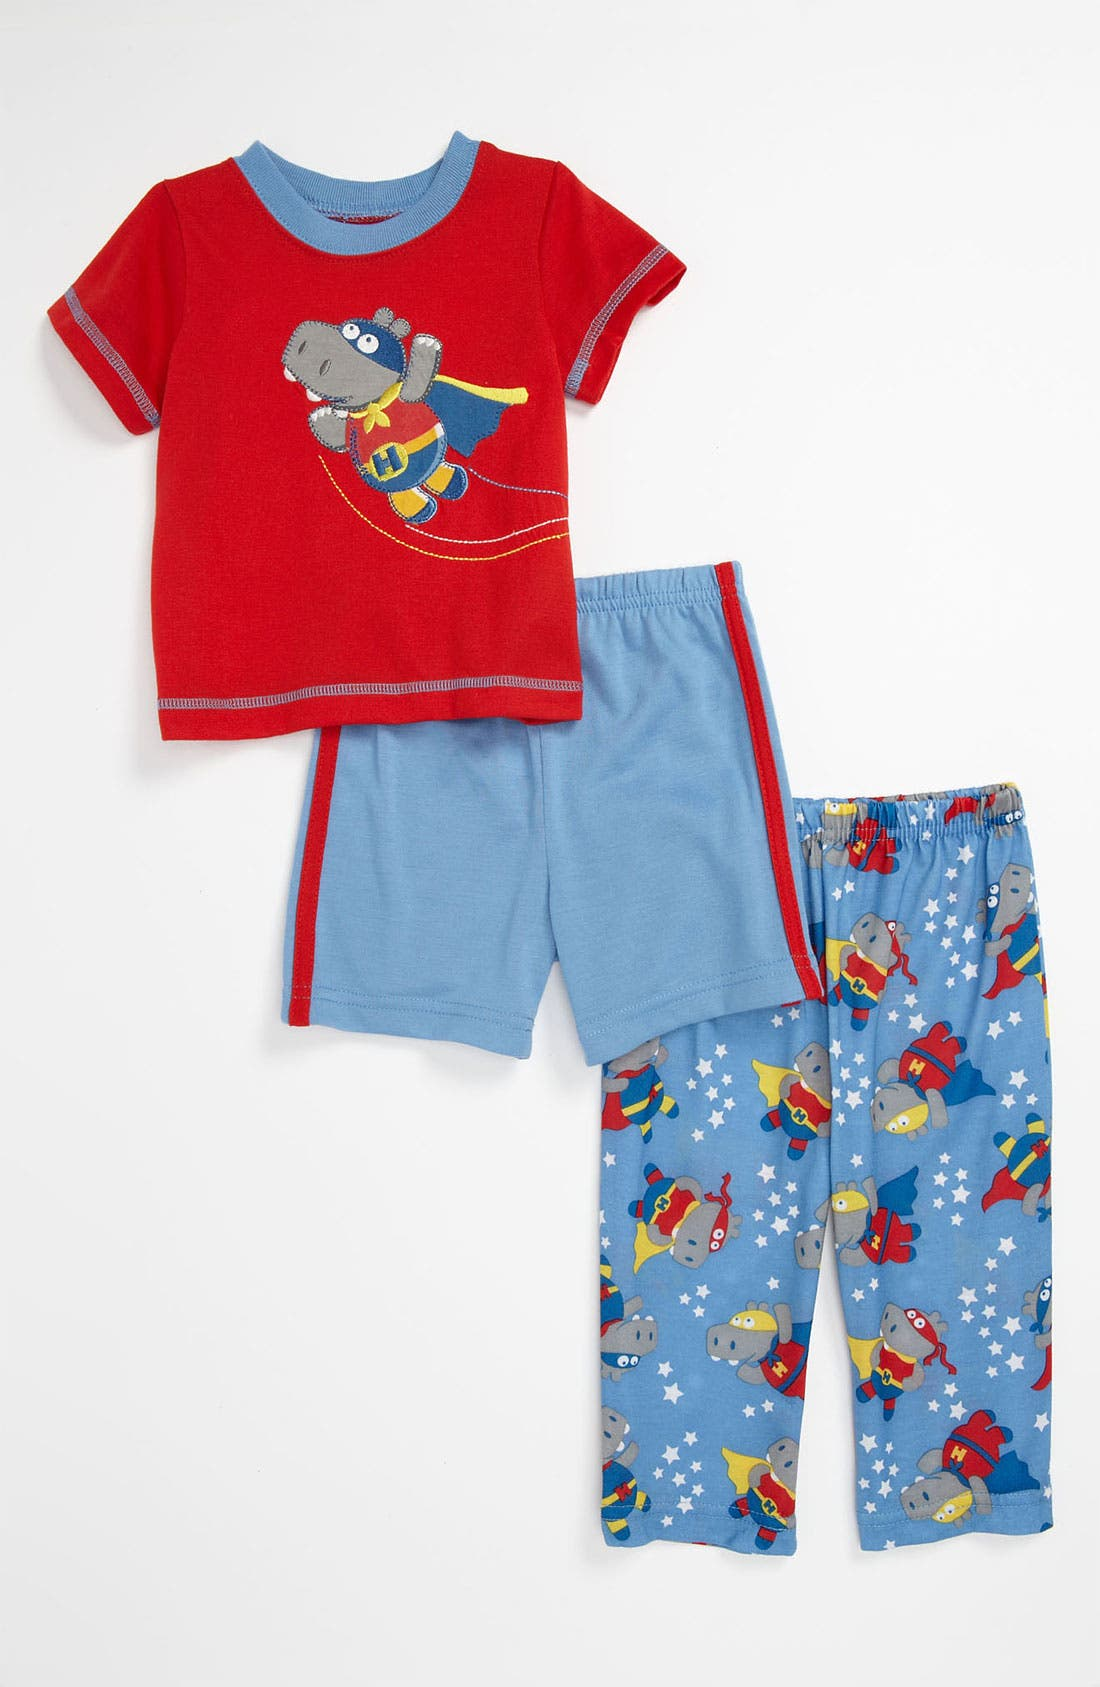 Main Image - Little Me 'Hippo' Sleepwear Set (Toddler)